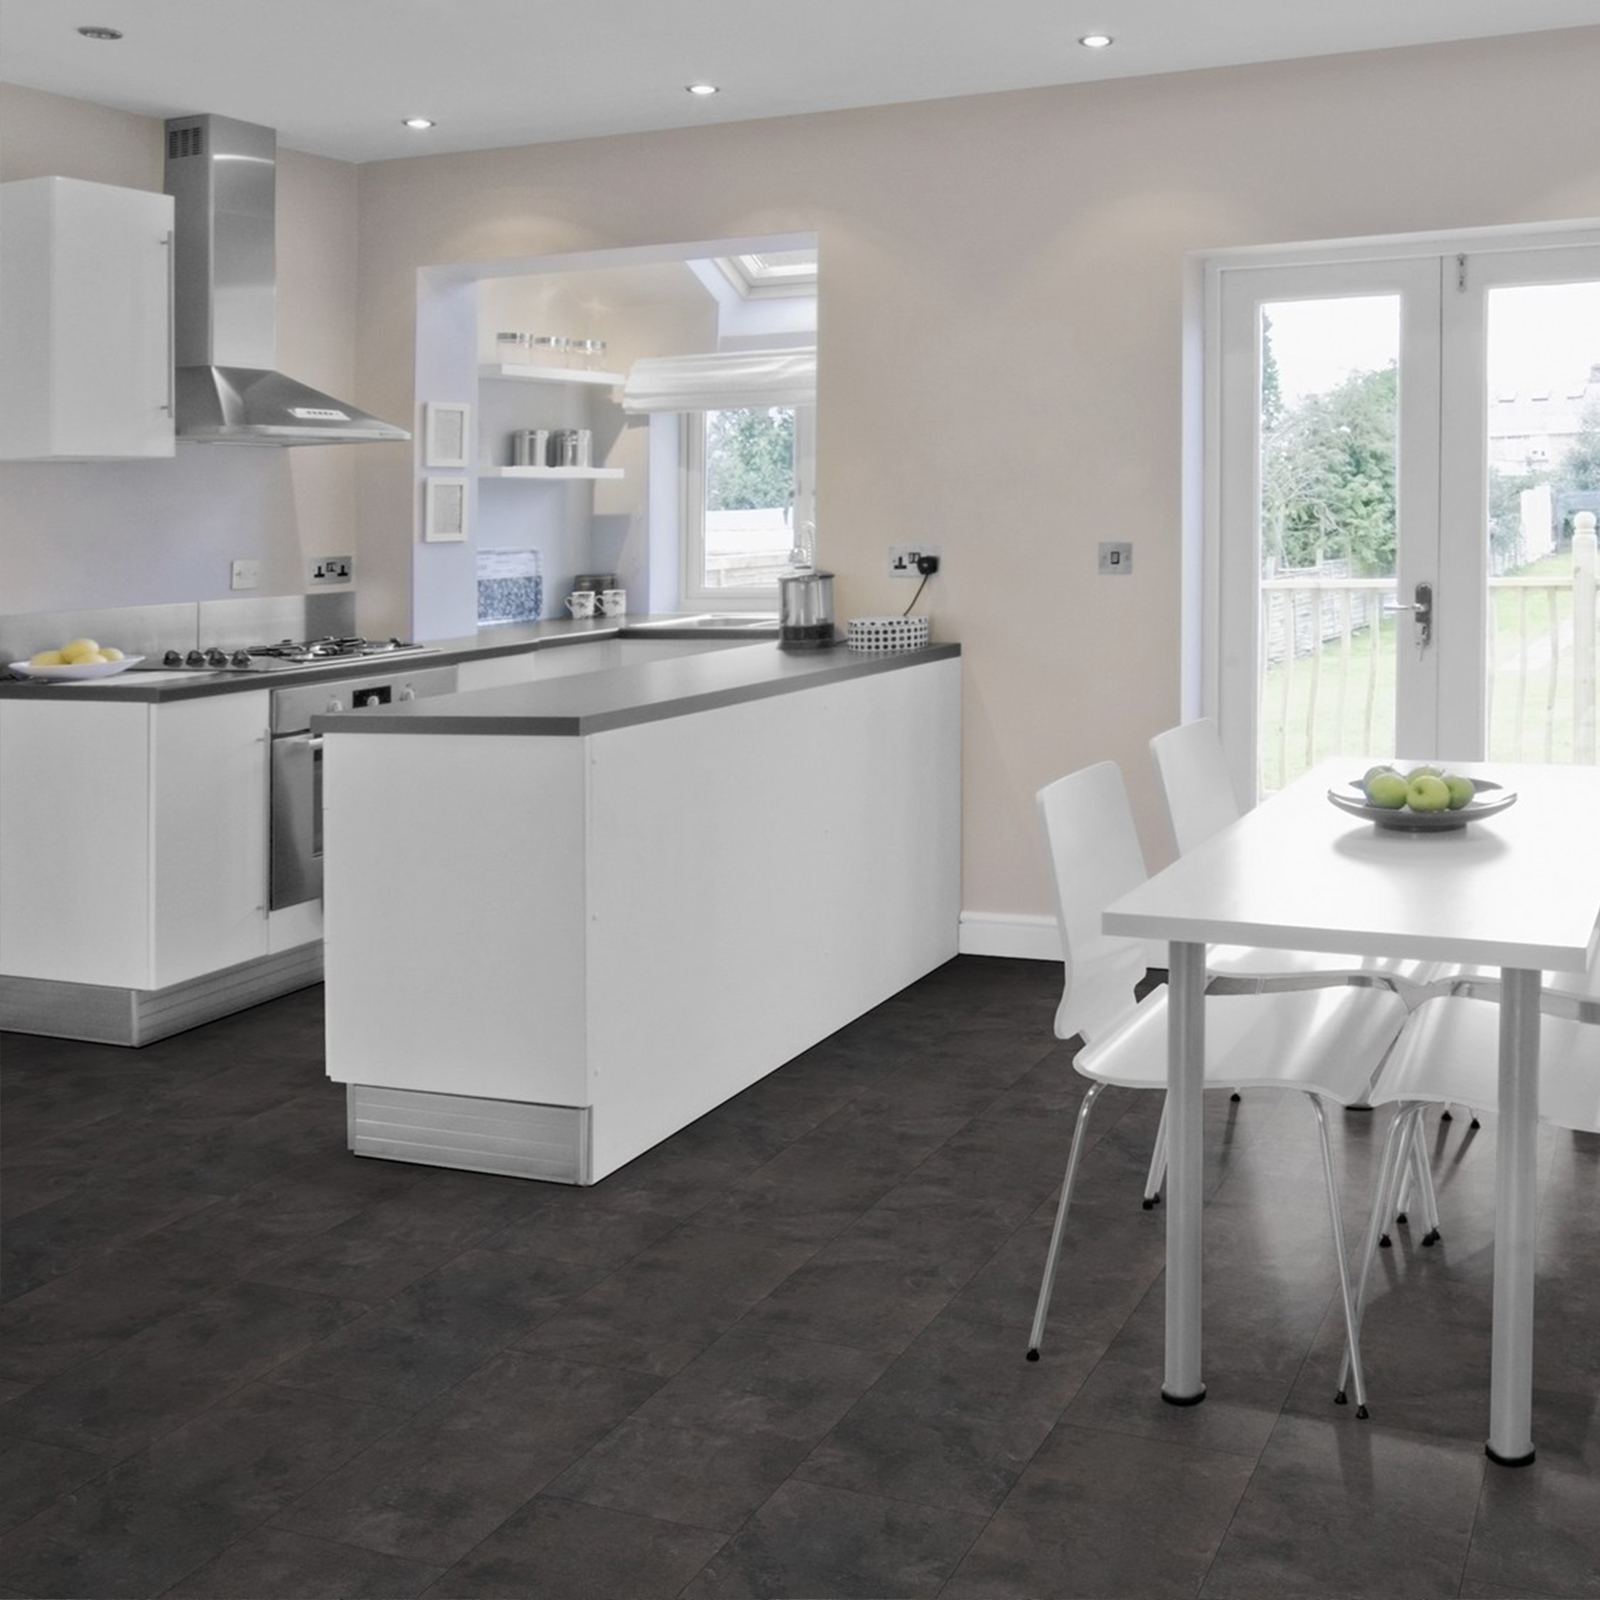 vinylboden pvc klick fliese bodenbelag steinoptik schiefer beton grau fuge ebay. Black Bedroom Furniture Sets. Home Design Ideas